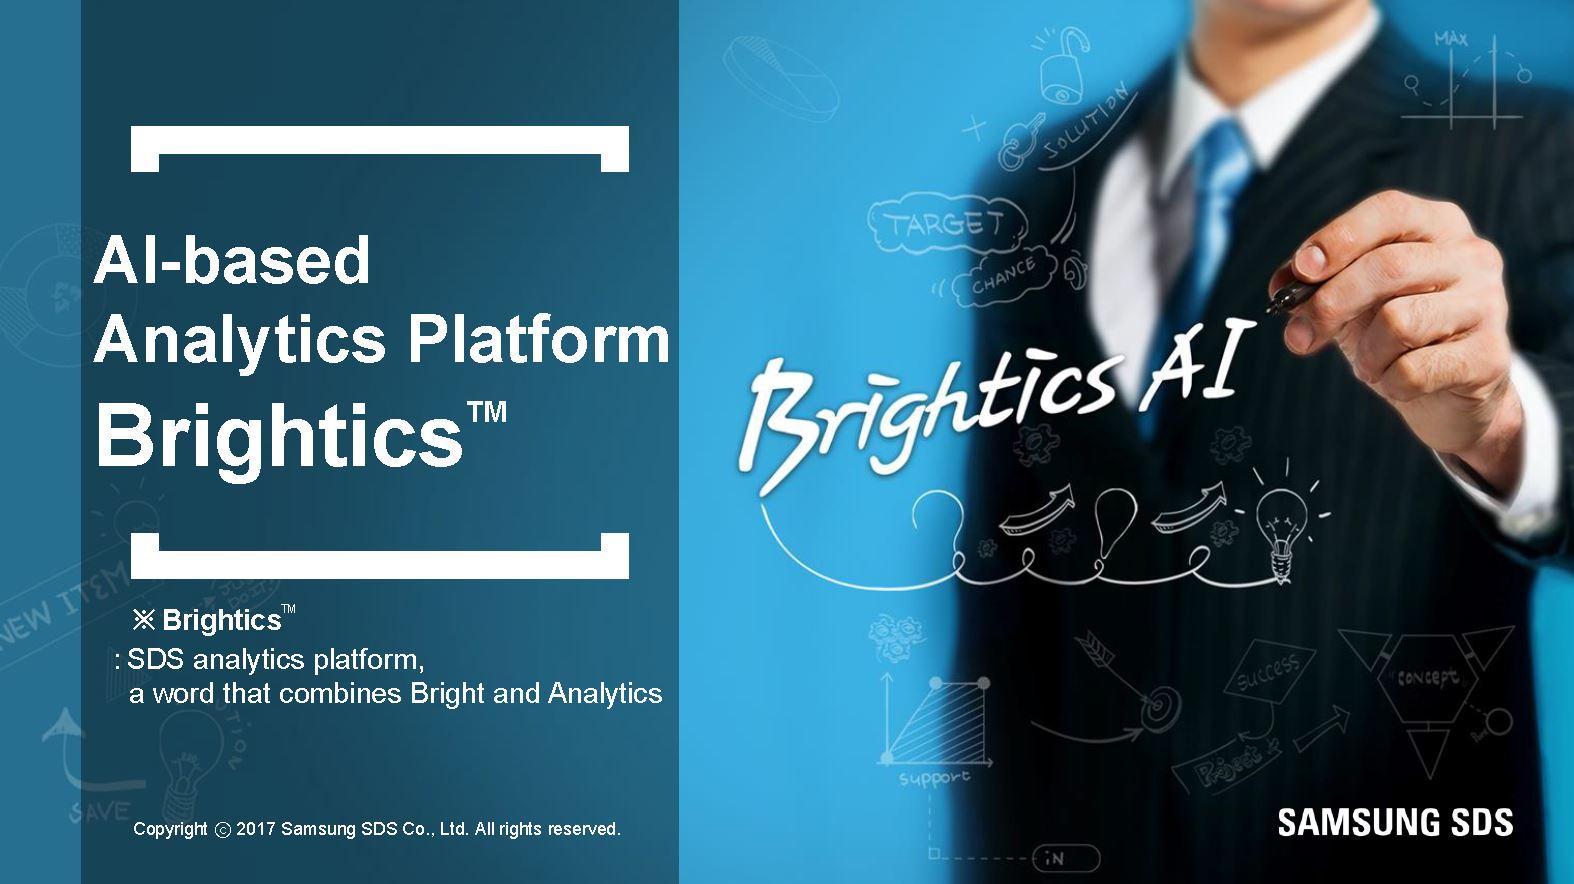 [Brightics]Perform comprehensive data analysis with Brightics AI